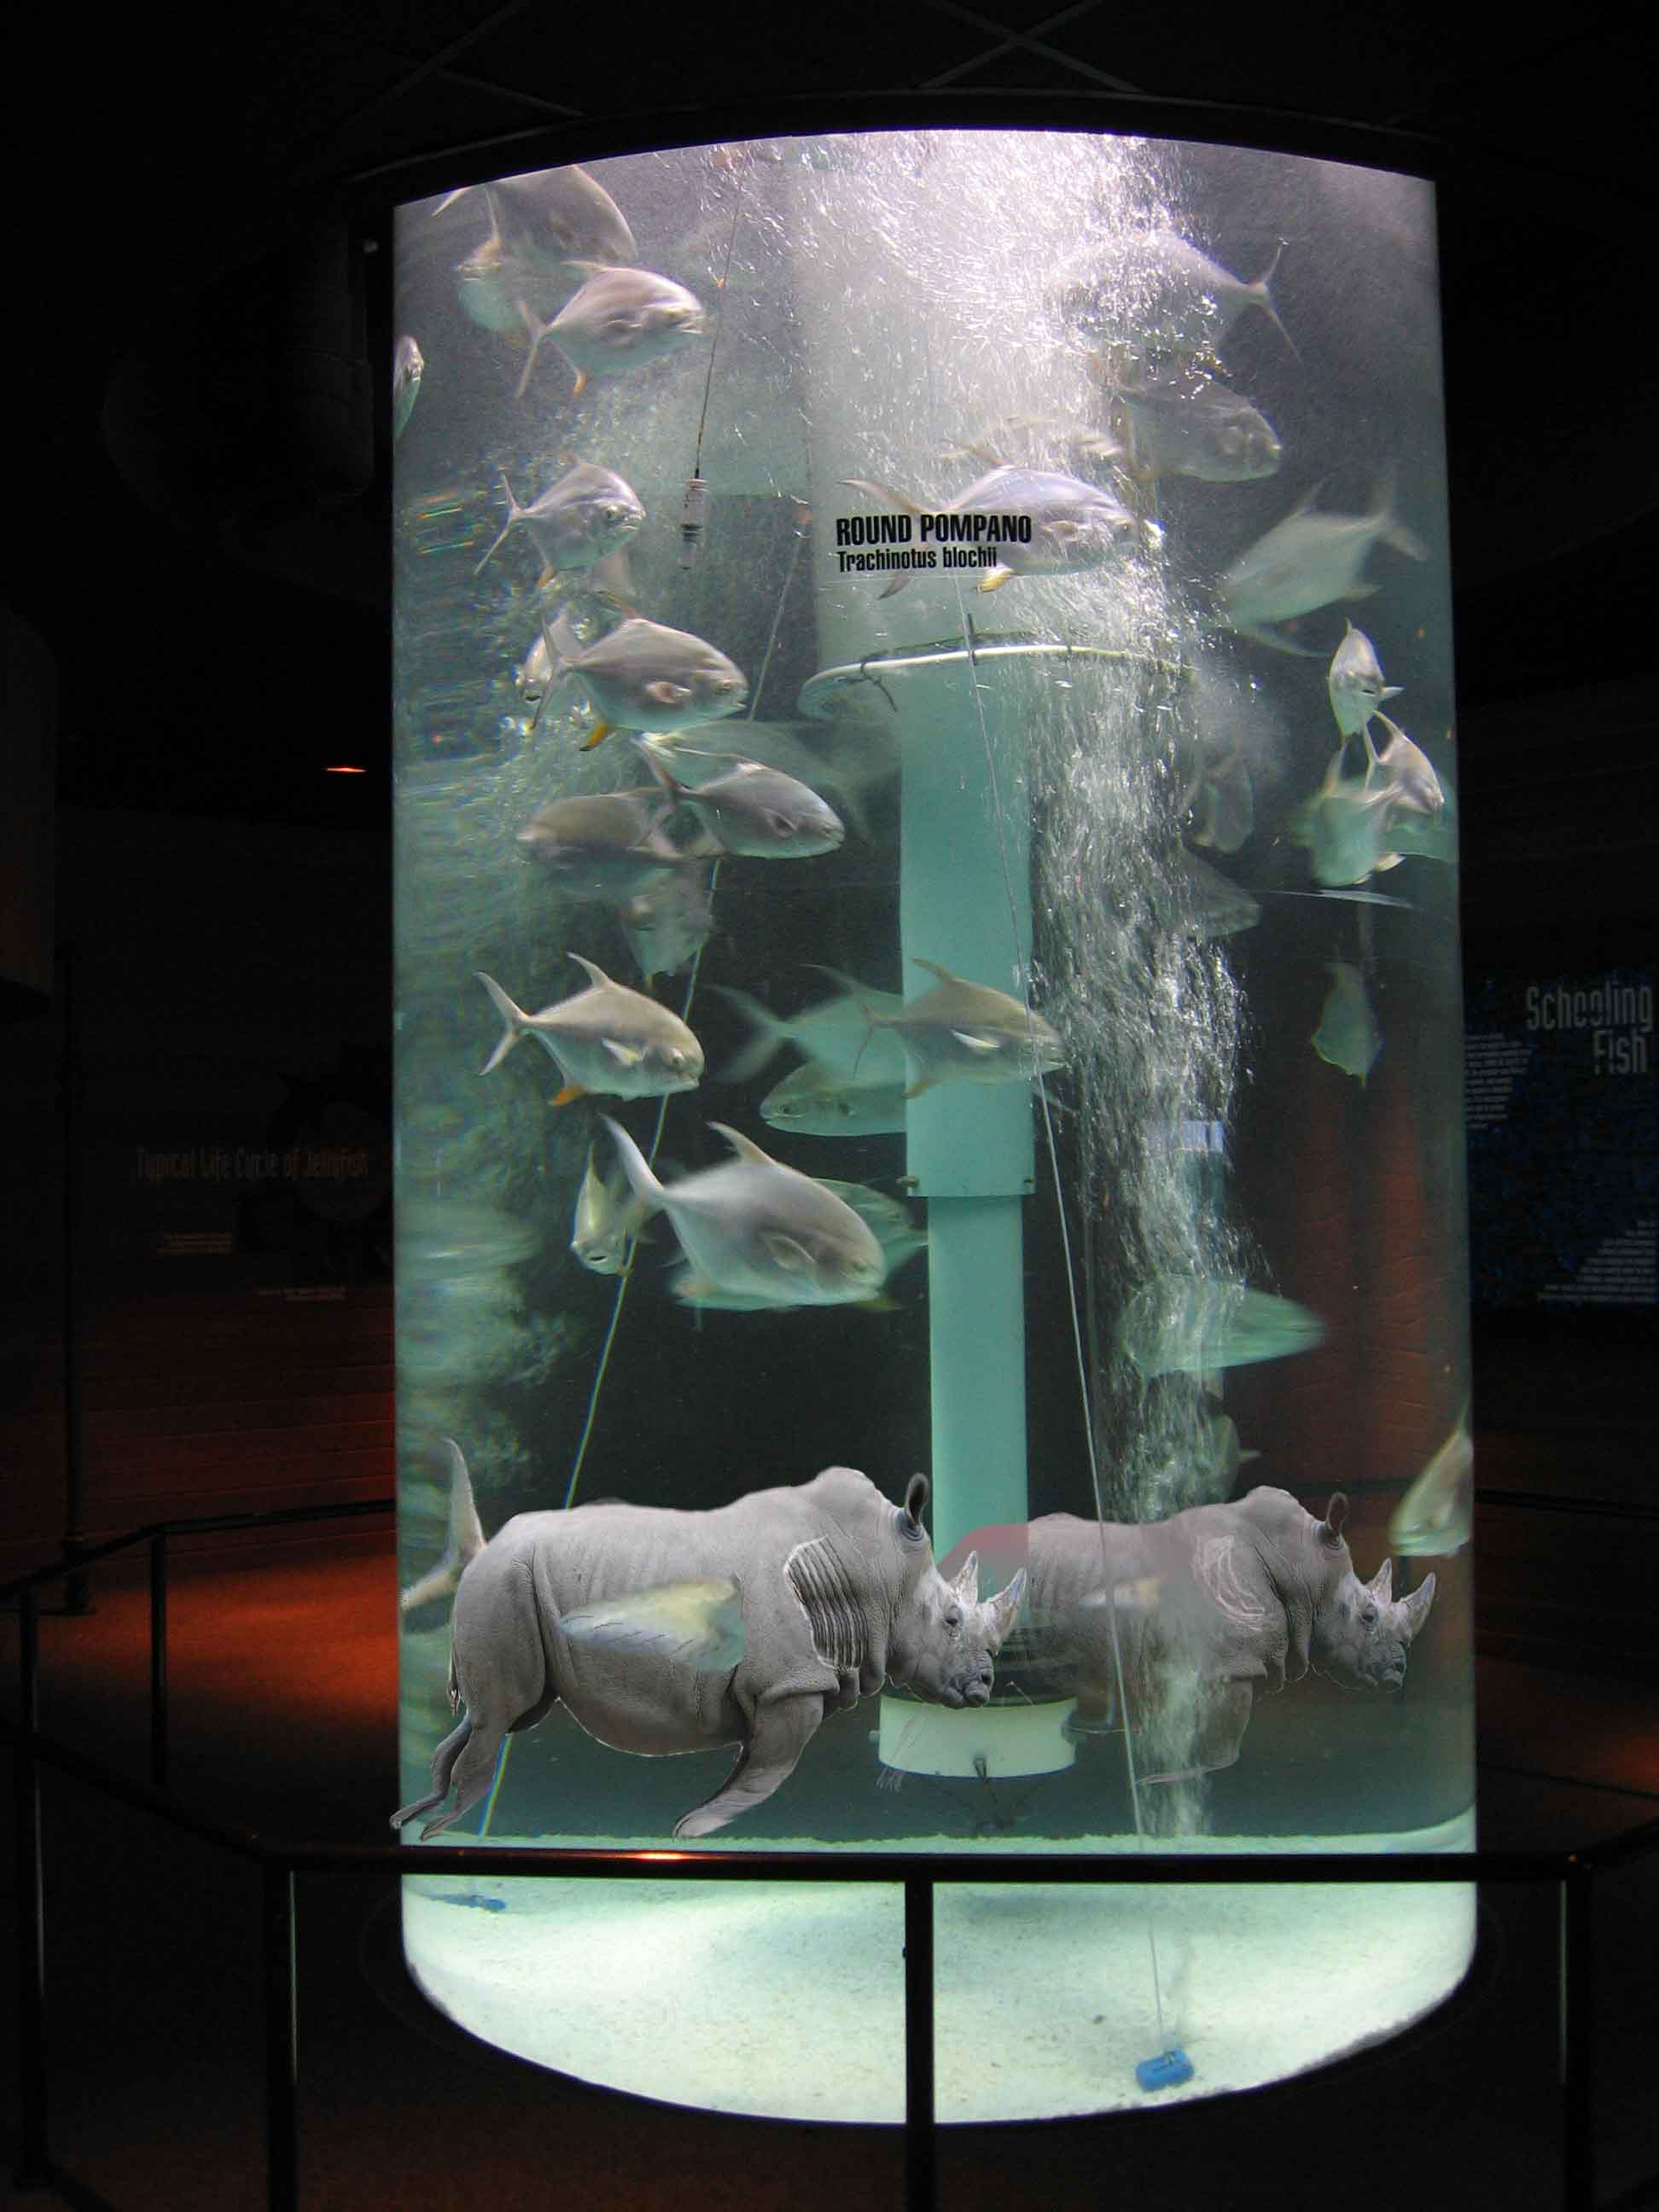 Fish in tank swimming - Fish In Tank Swimming